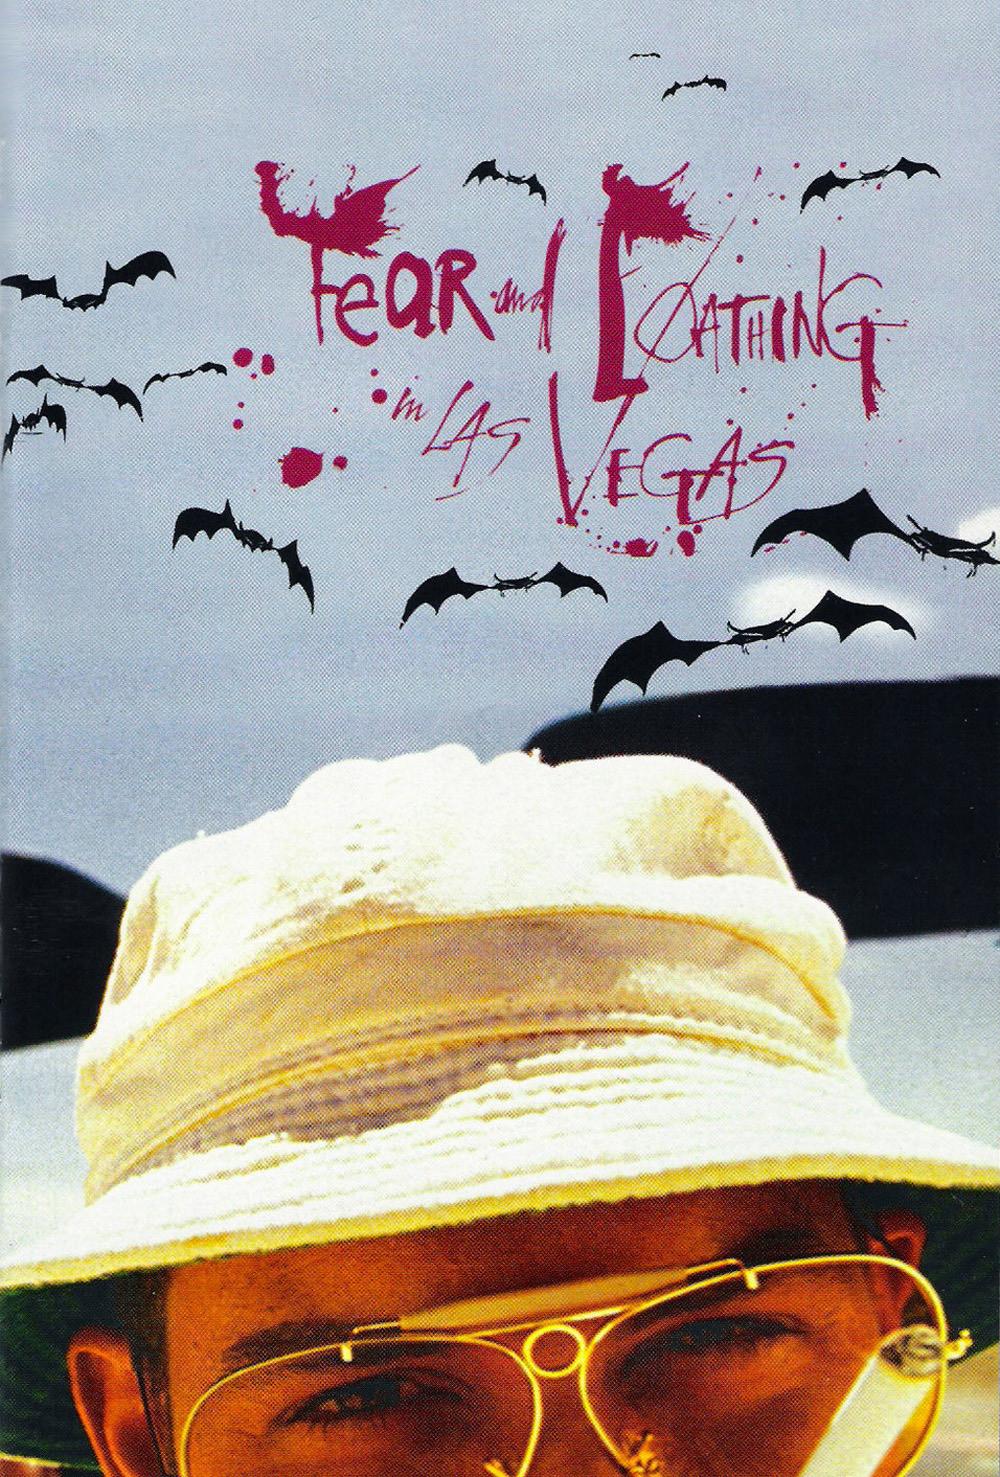 Free Download Fear And Loathing In Las Vegas Posters Hd Desktop